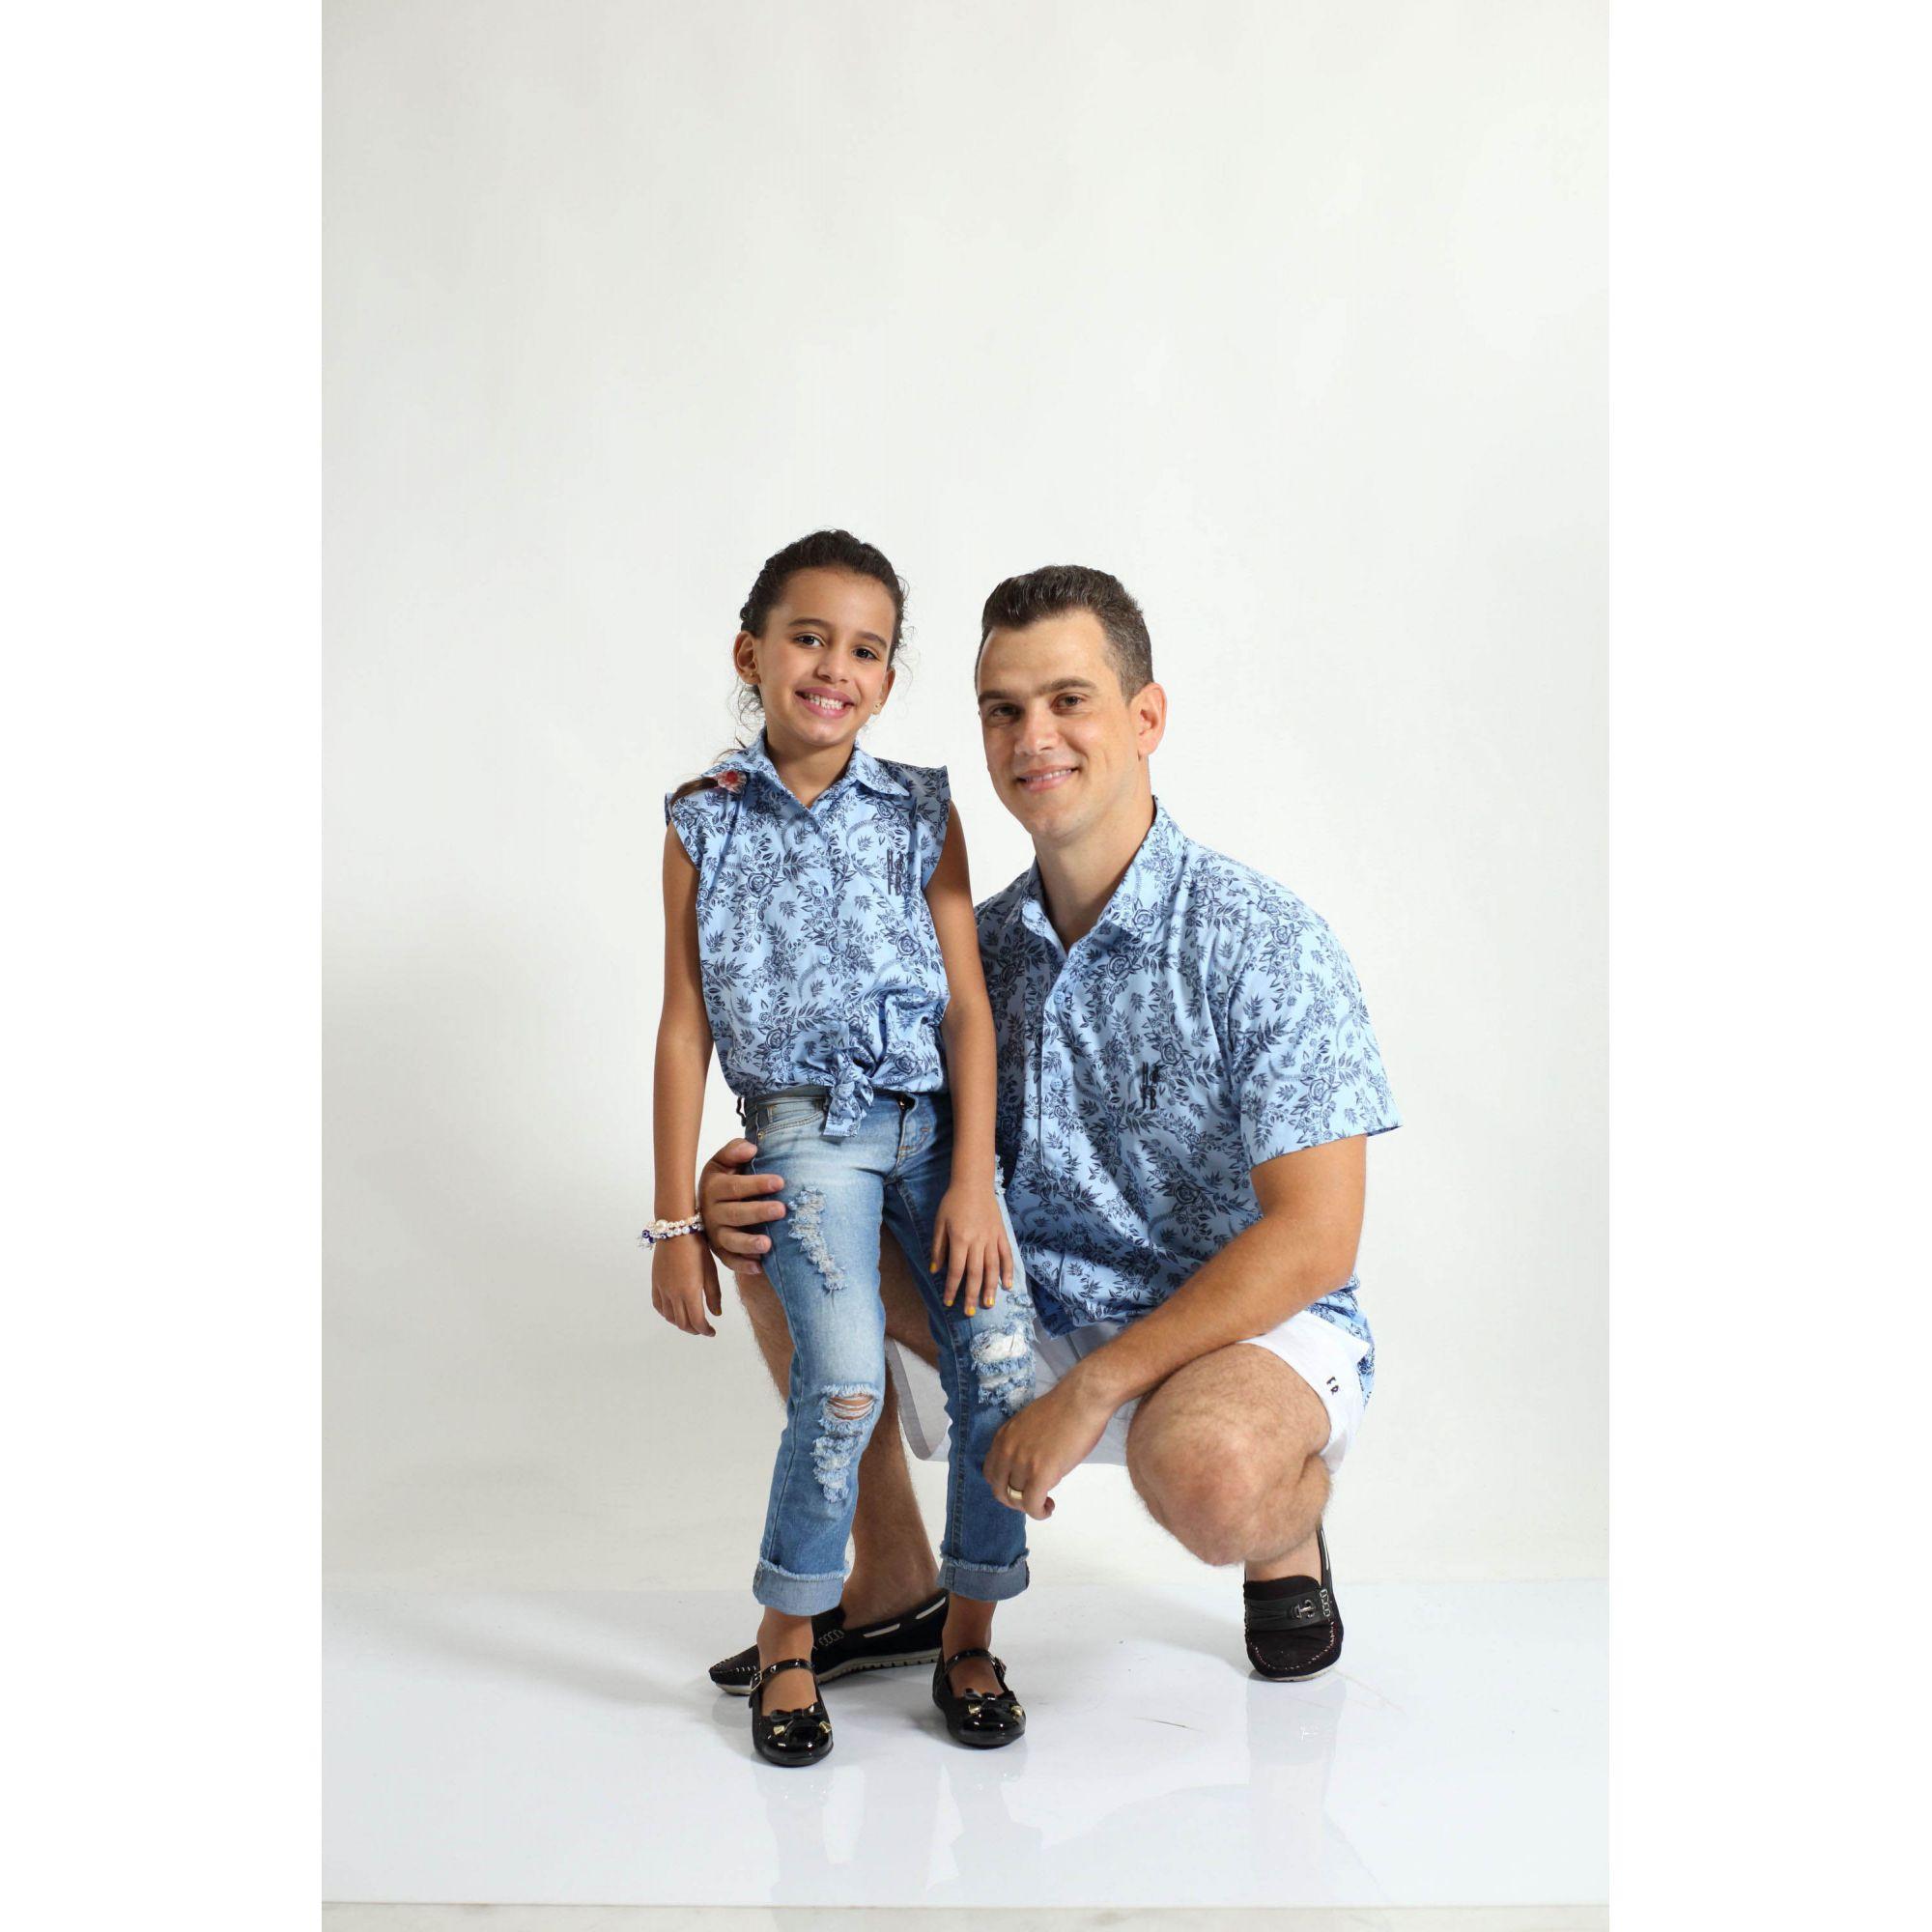 9b65cf26c7394 ... PAI E FILHA > Kit 02 Camisas Manga Curta Azul Floral [Coleção Tal Pai  Tal ...